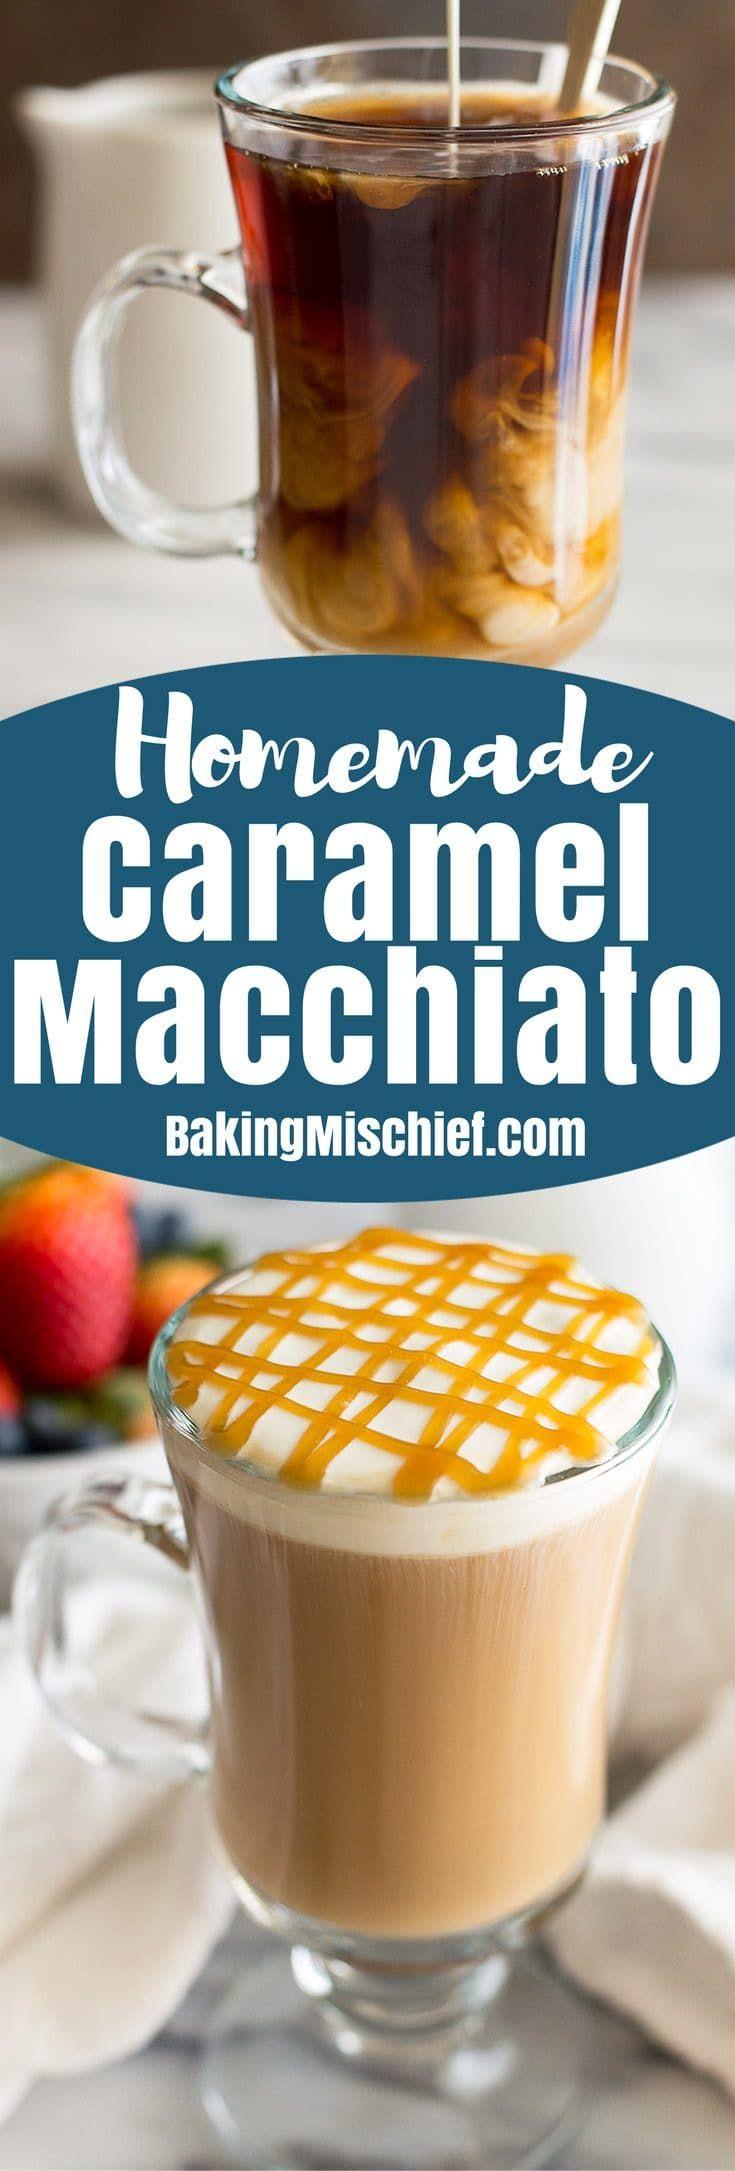 A homemade copycat recipe for Starbucks' caramel macchiato, but better! From BakingMischief.com